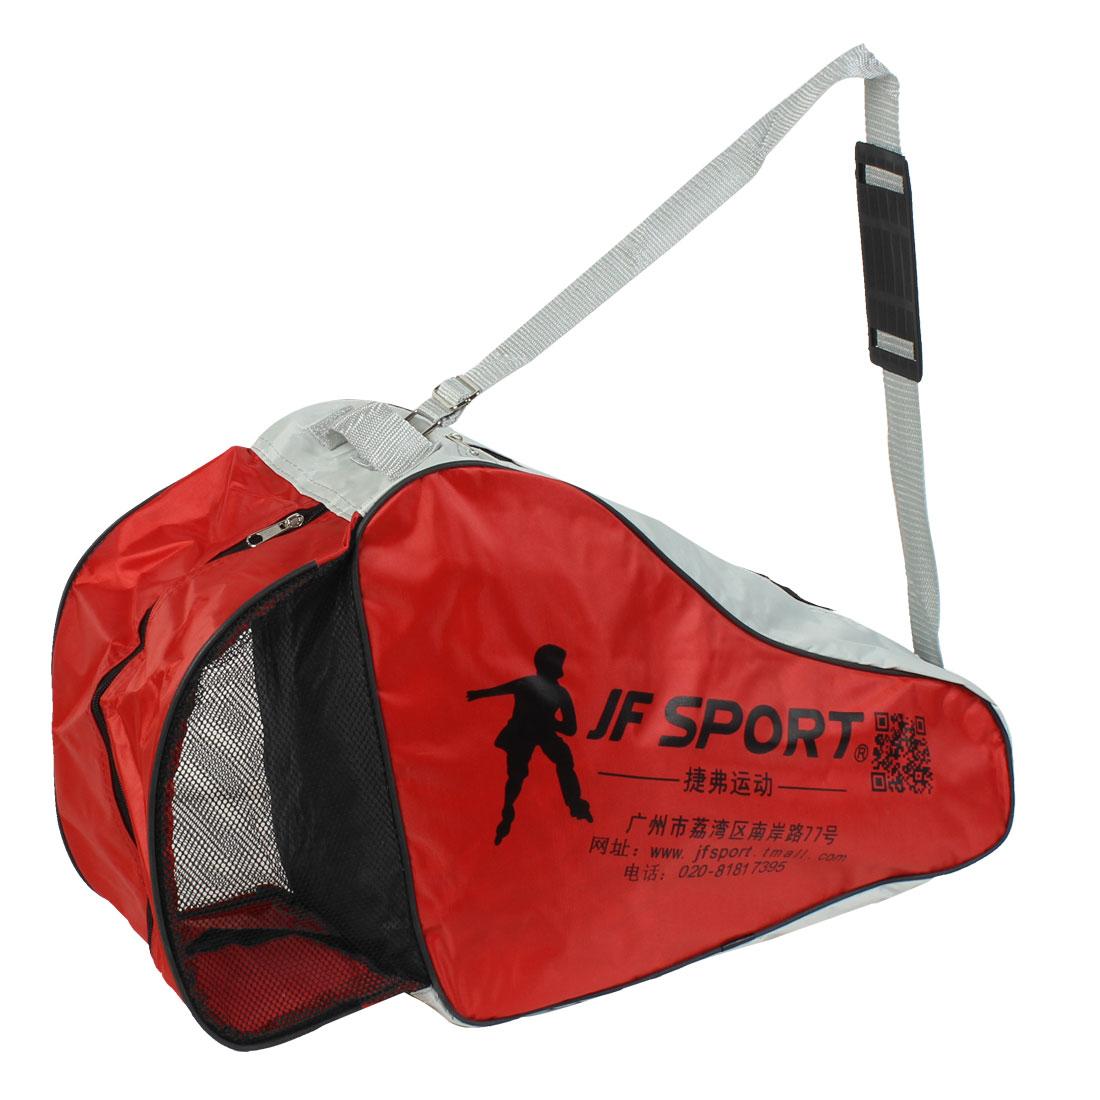 Nylon Portable Ice Skate Skating Strap Carry Bag Red Gray for Roller-blade Sport